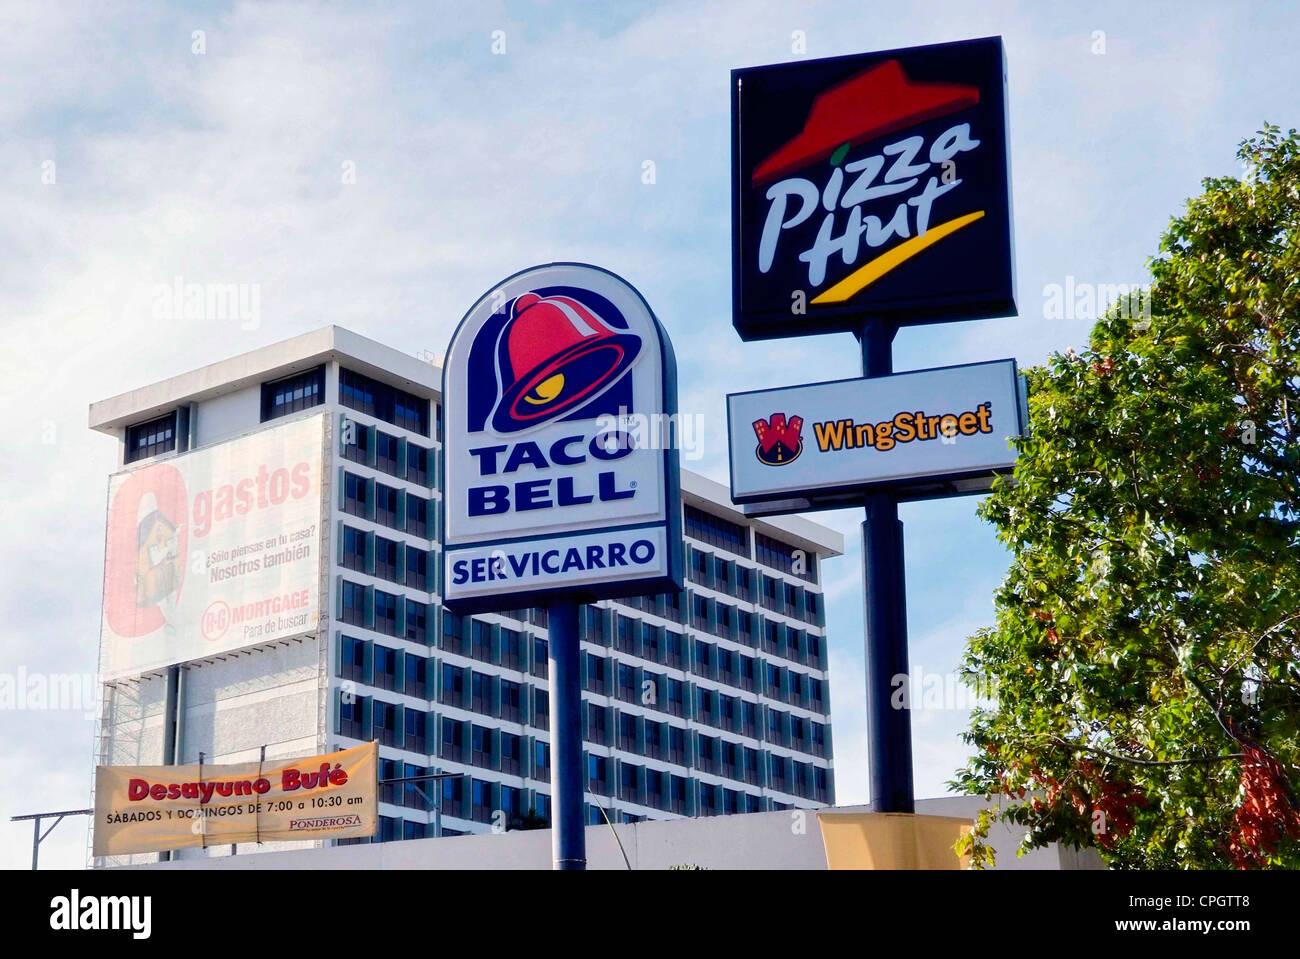 PUERTO RICO - SAN JUAN - Santurce US fast food signs - Stock Image